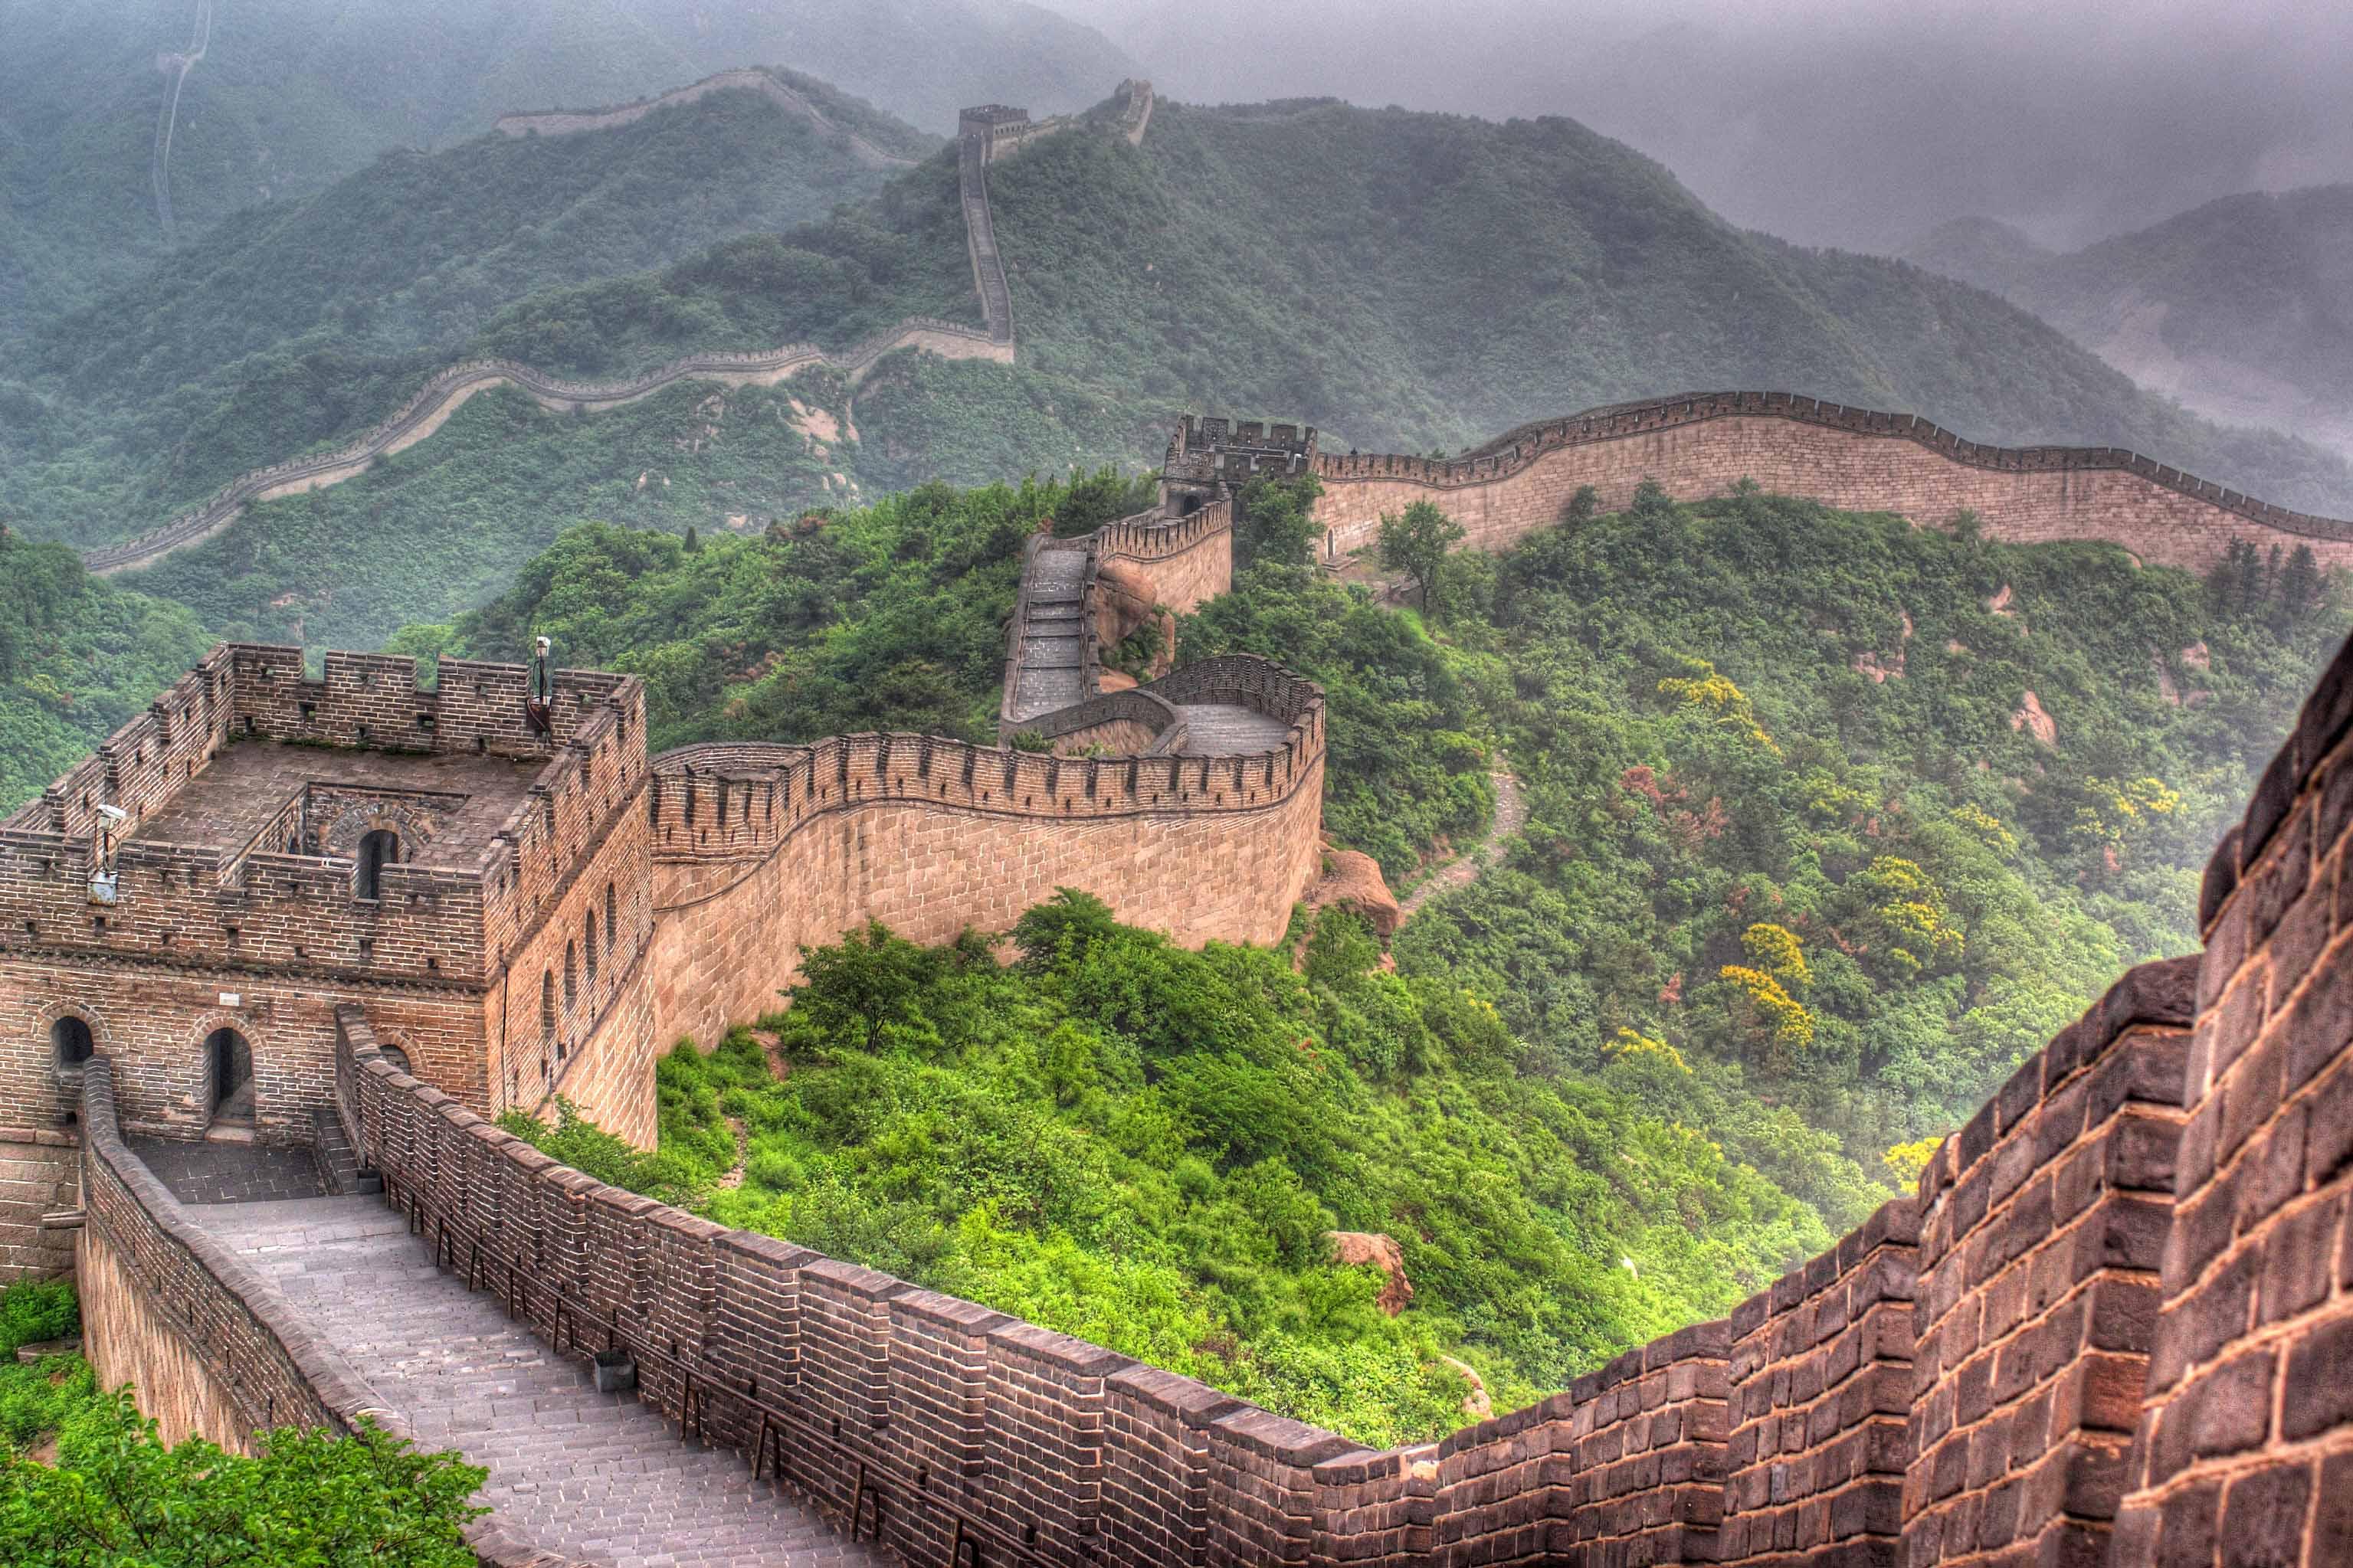 دیوار بزرگ چین The Great Wall of China